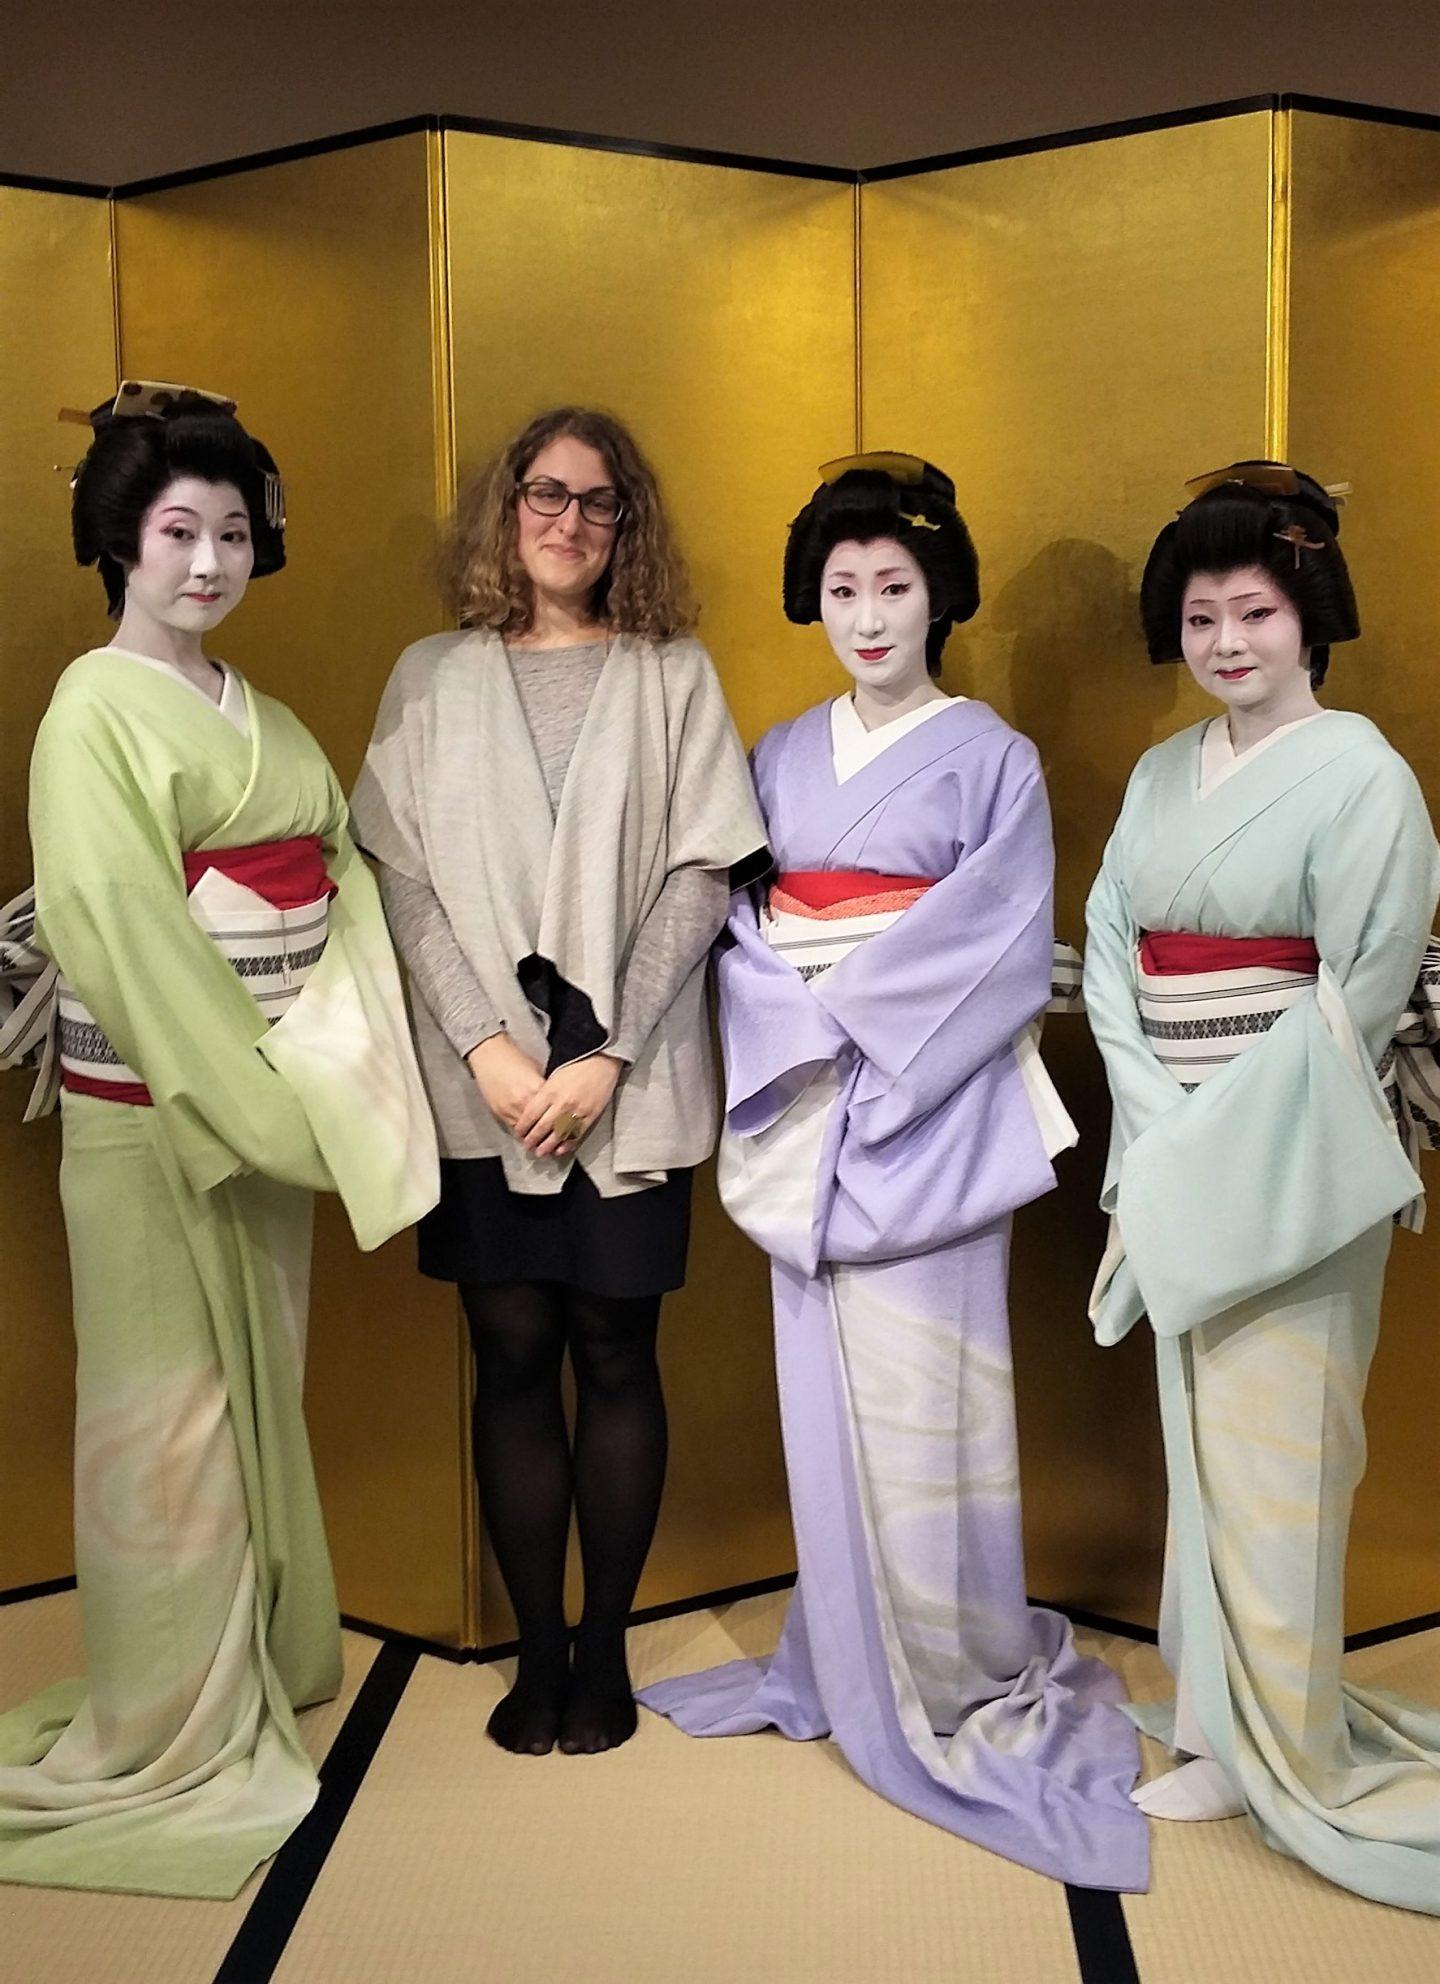 Handgepäck Japan